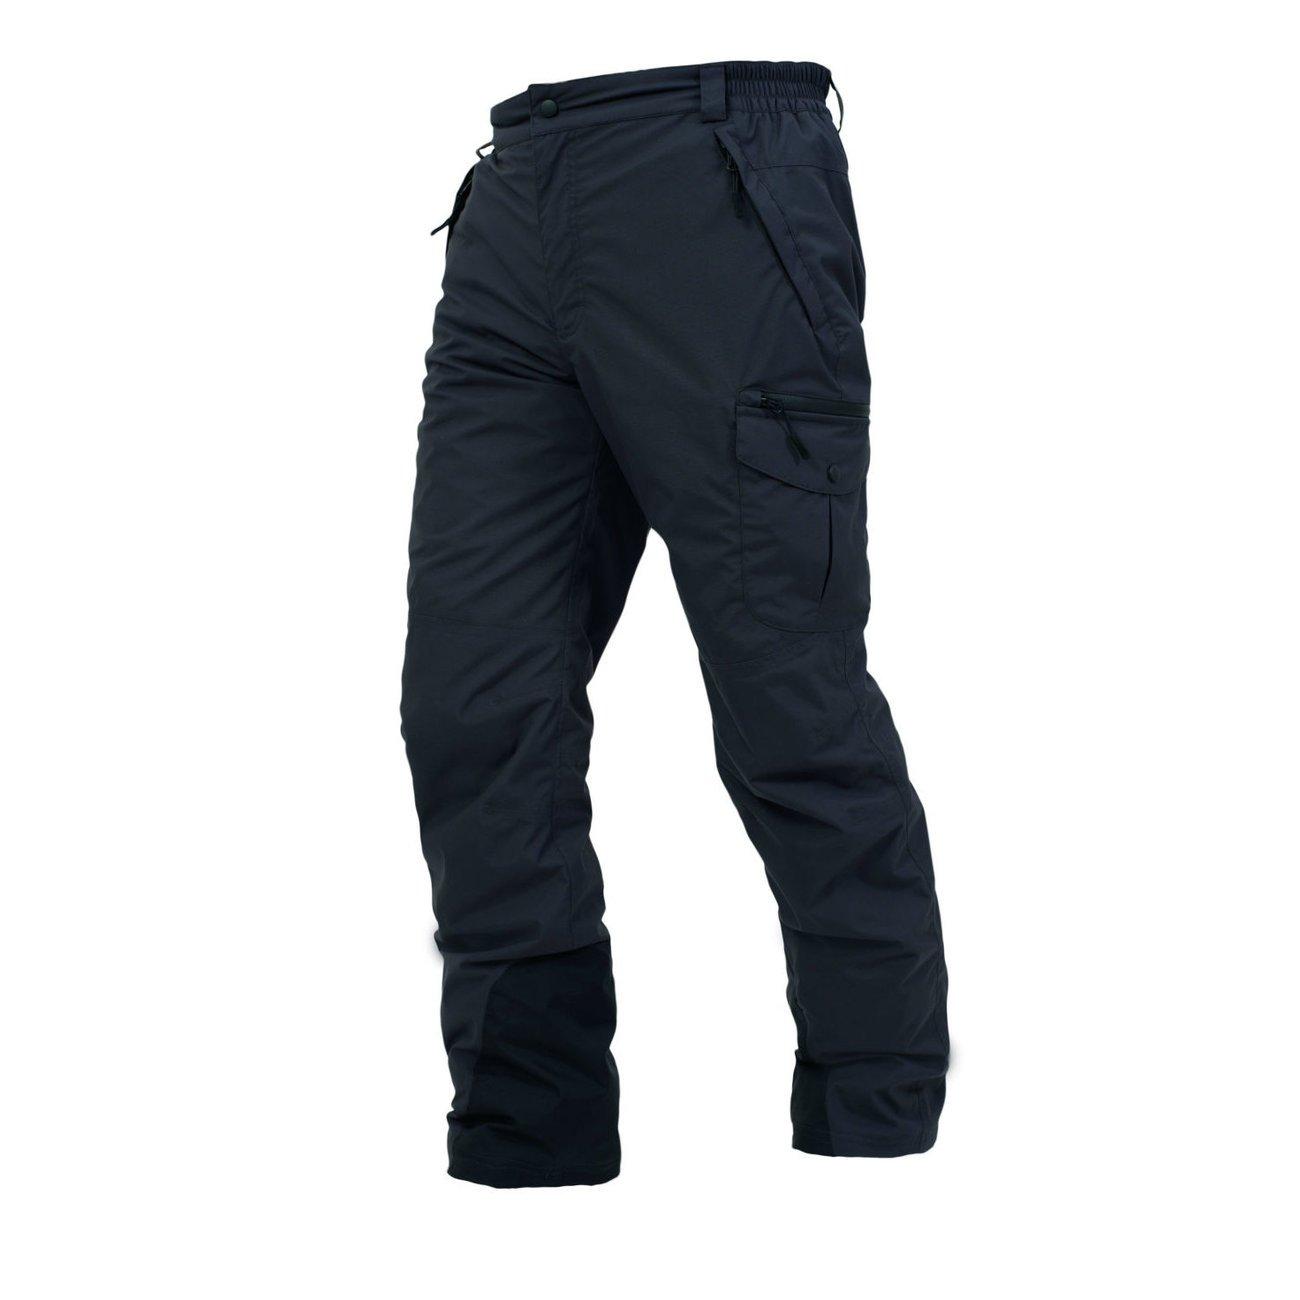 Owney Outdoor Herrenhose YUKON Pants